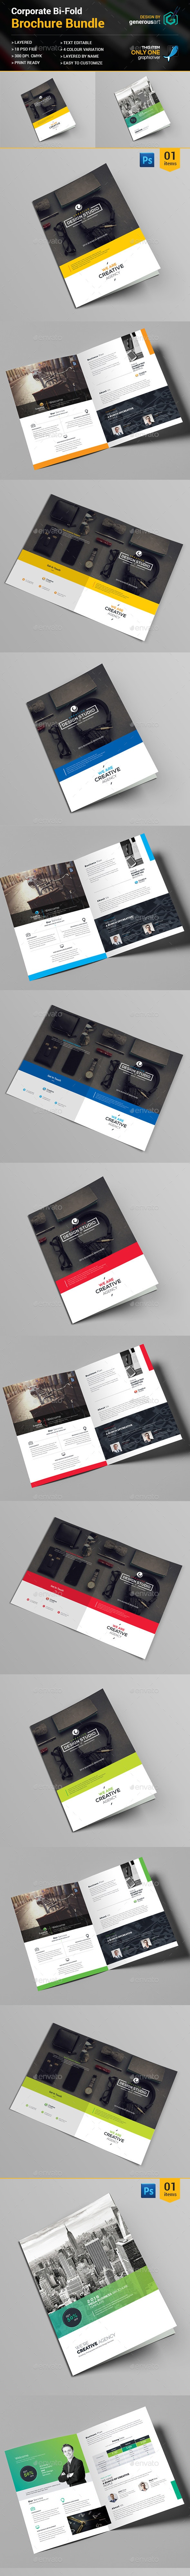 Bi-Fold Brochure_Bundle_2 in 1 - Corporate Brochures